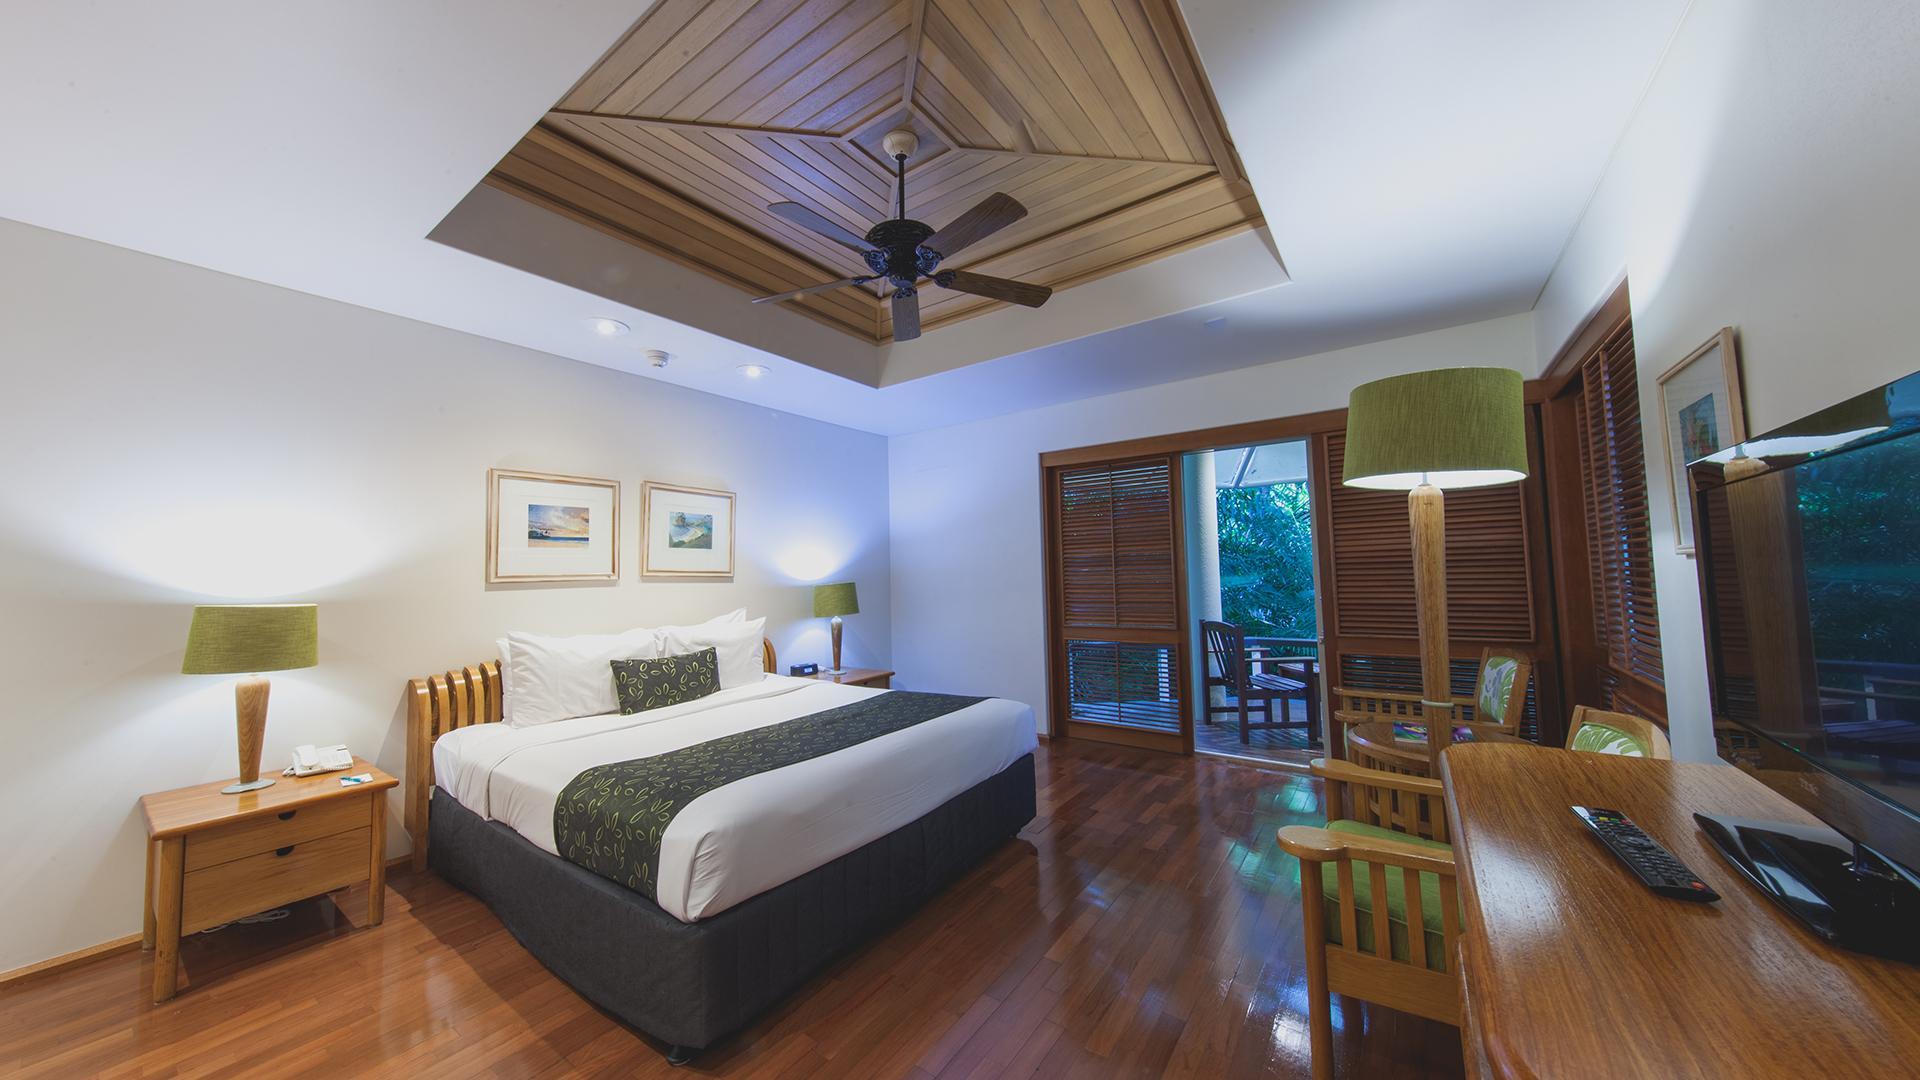 Island Suite image 1 at Green Island Resort by Cairns Regional, Queensland, Australia